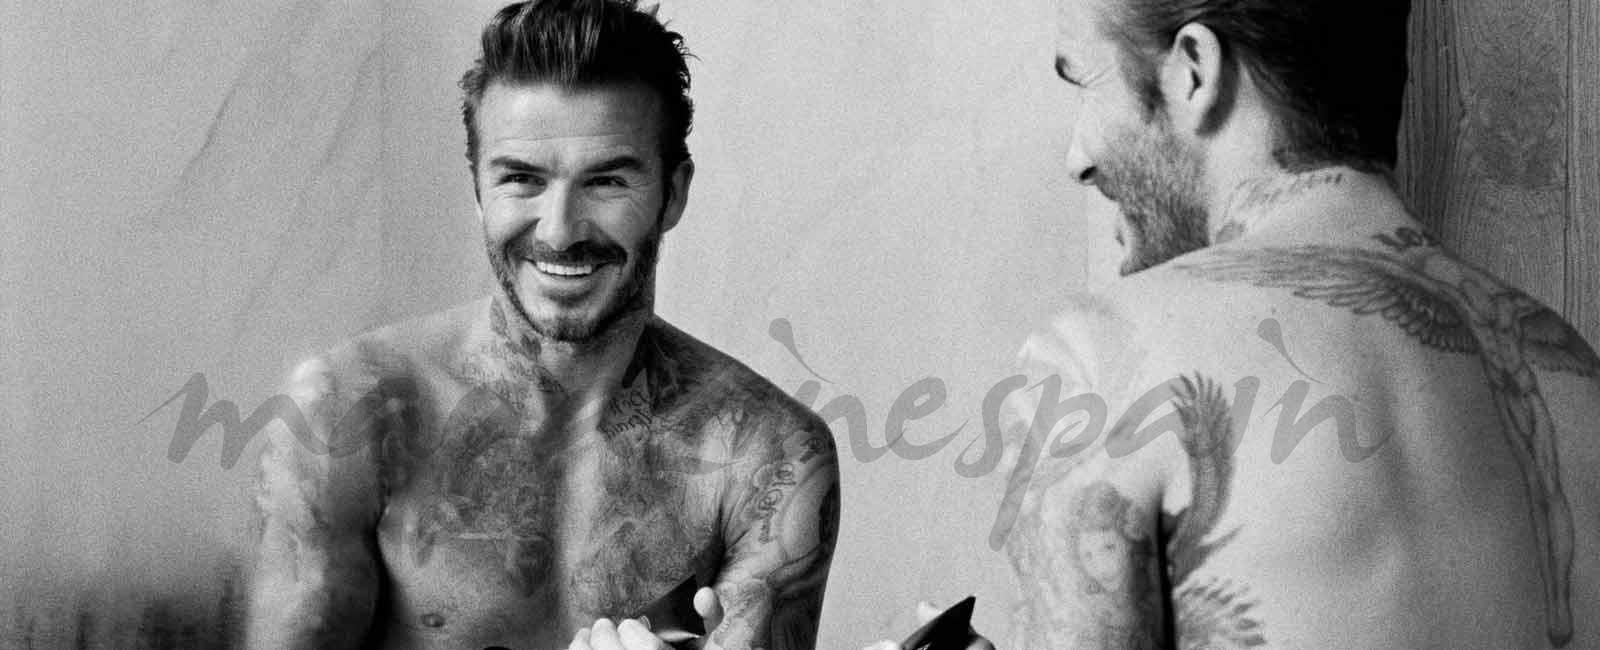 Los secretos de belleza de David Beckham